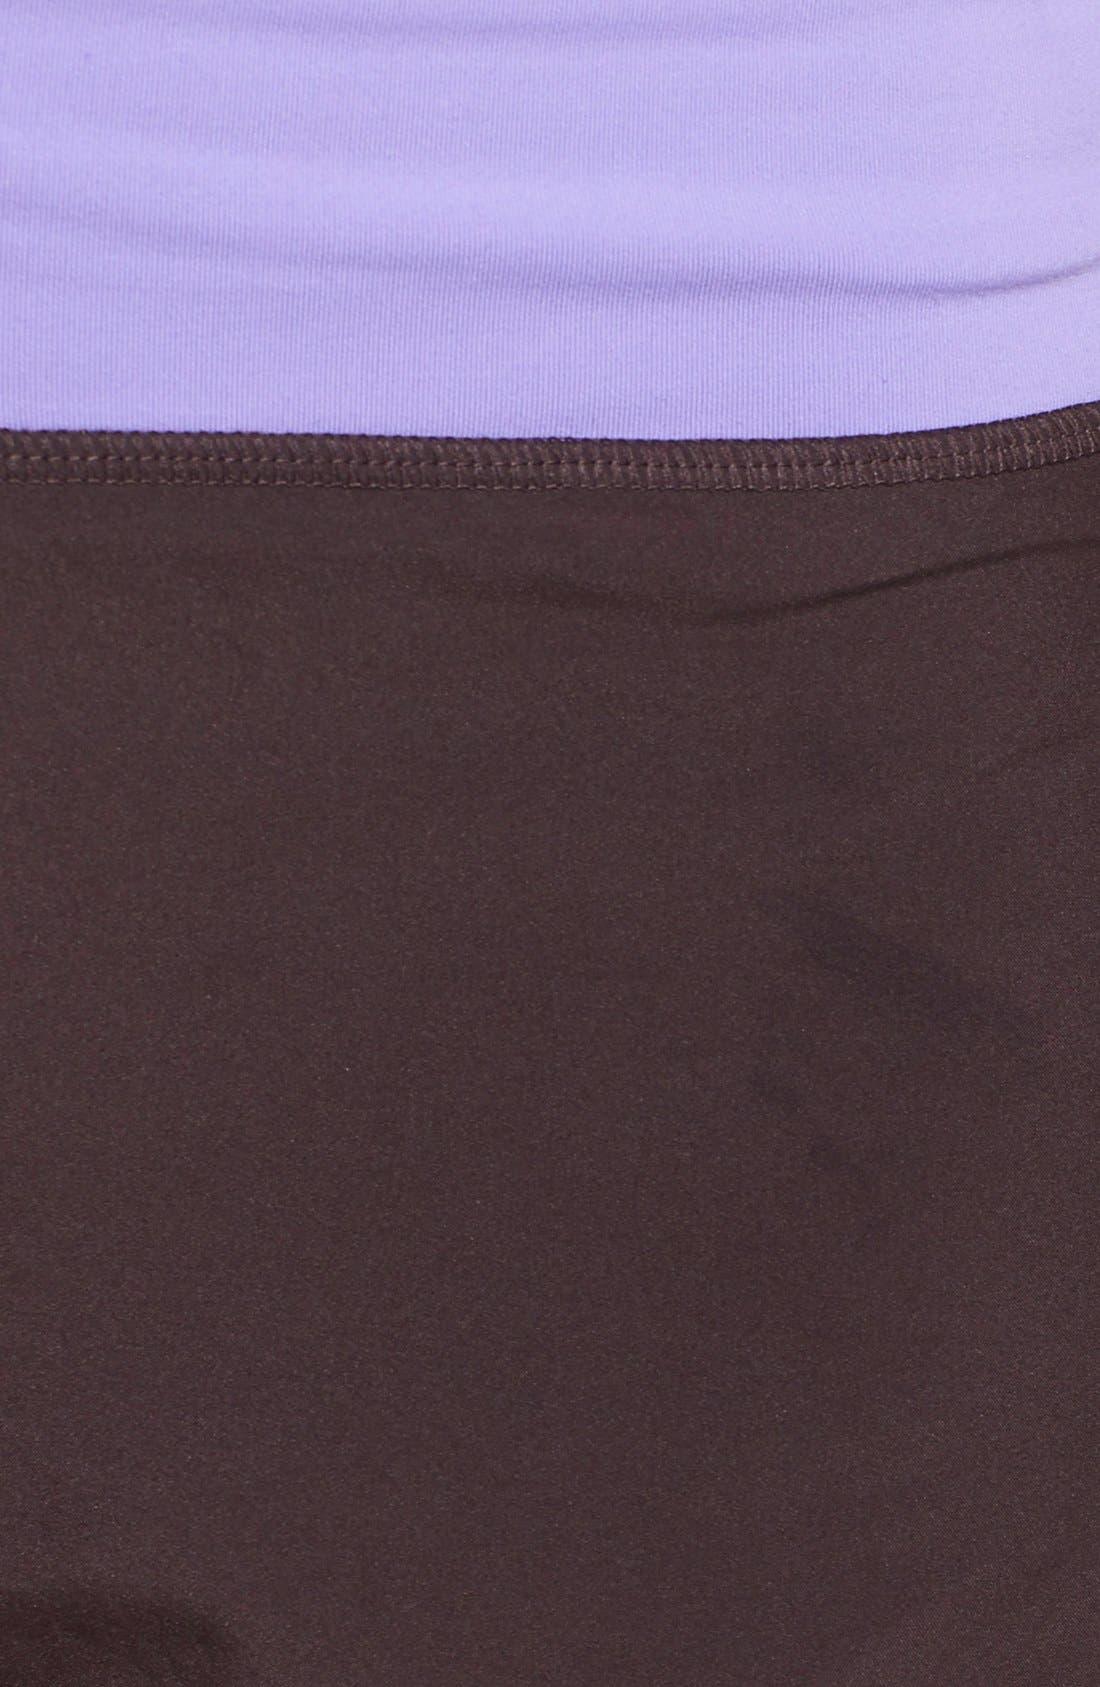 Alternate Image 4  - Reebok 'ONE Series' Shorts